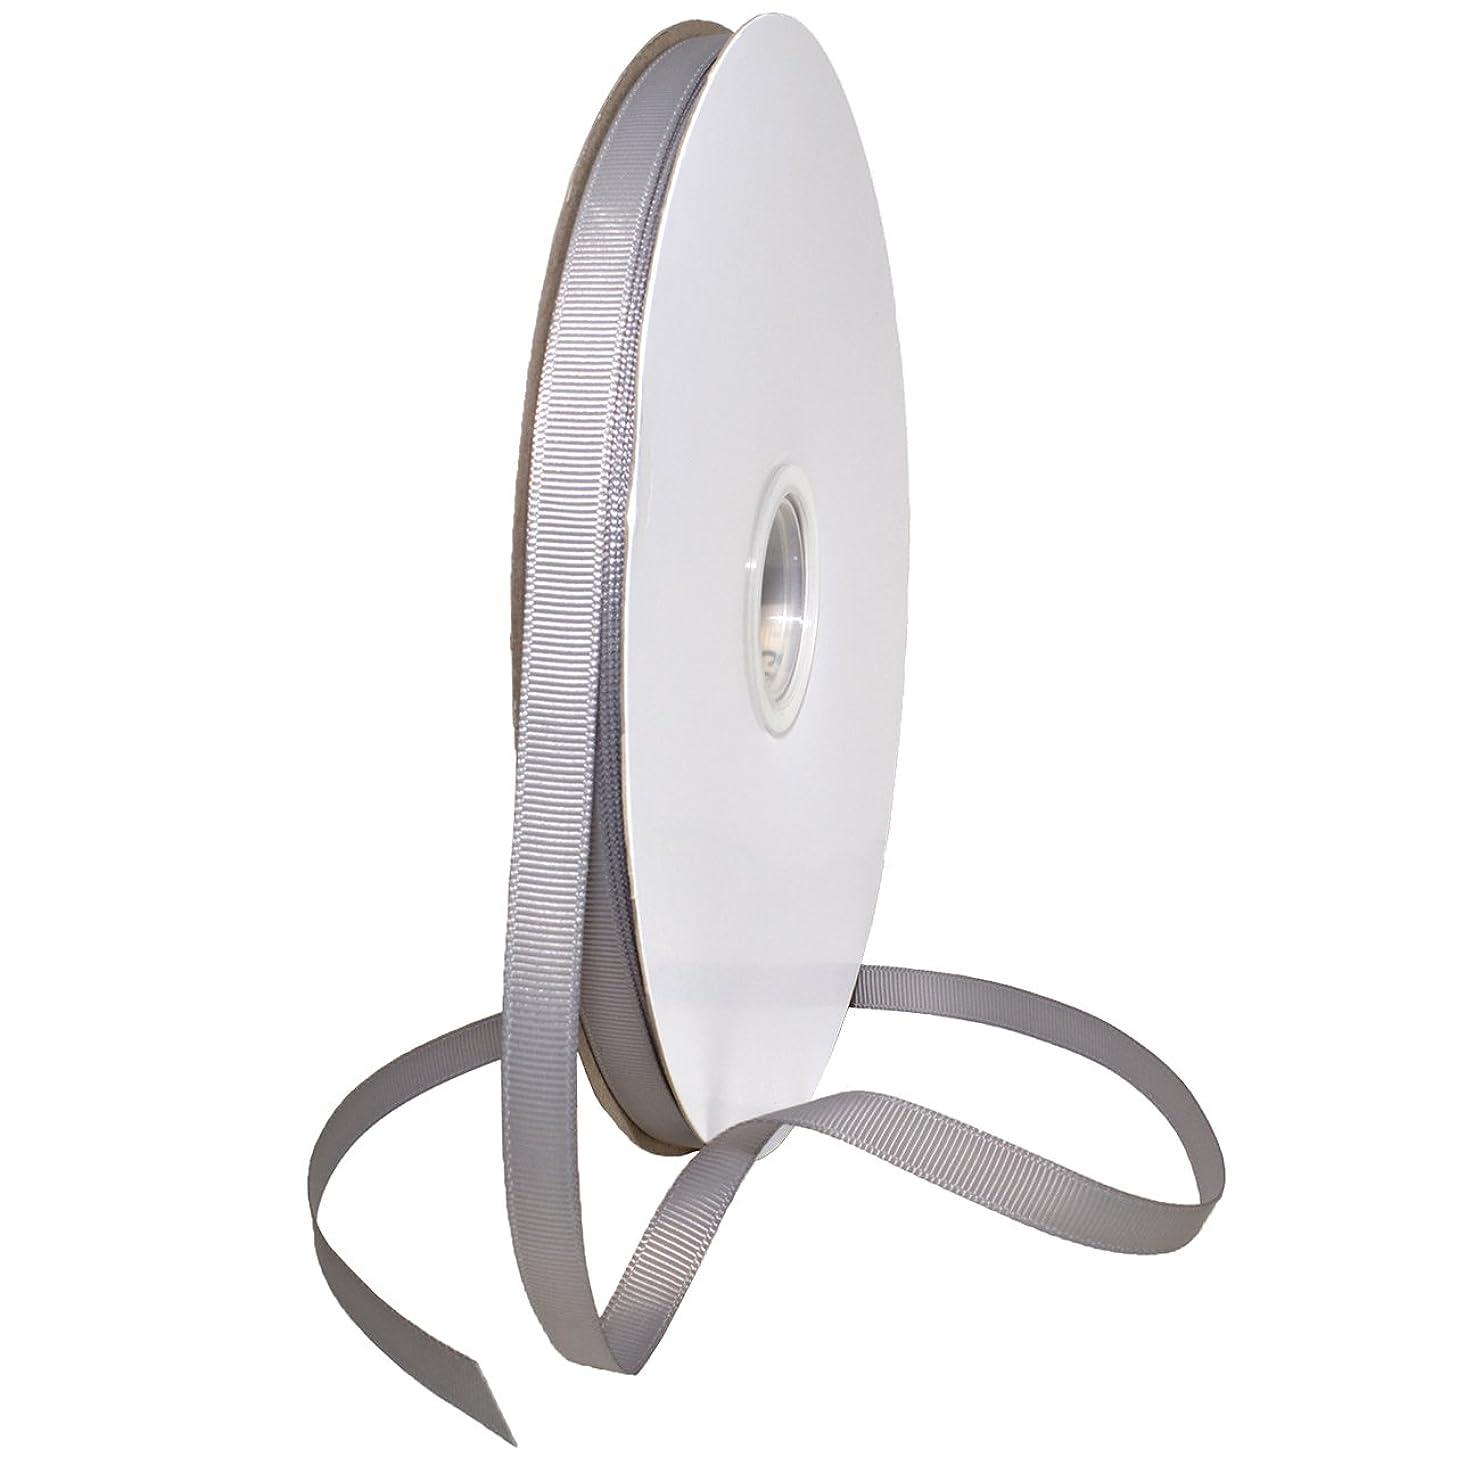 Morex Ribbon 06609/00-012 Grosgrain Fabric Ribbon, 3/8